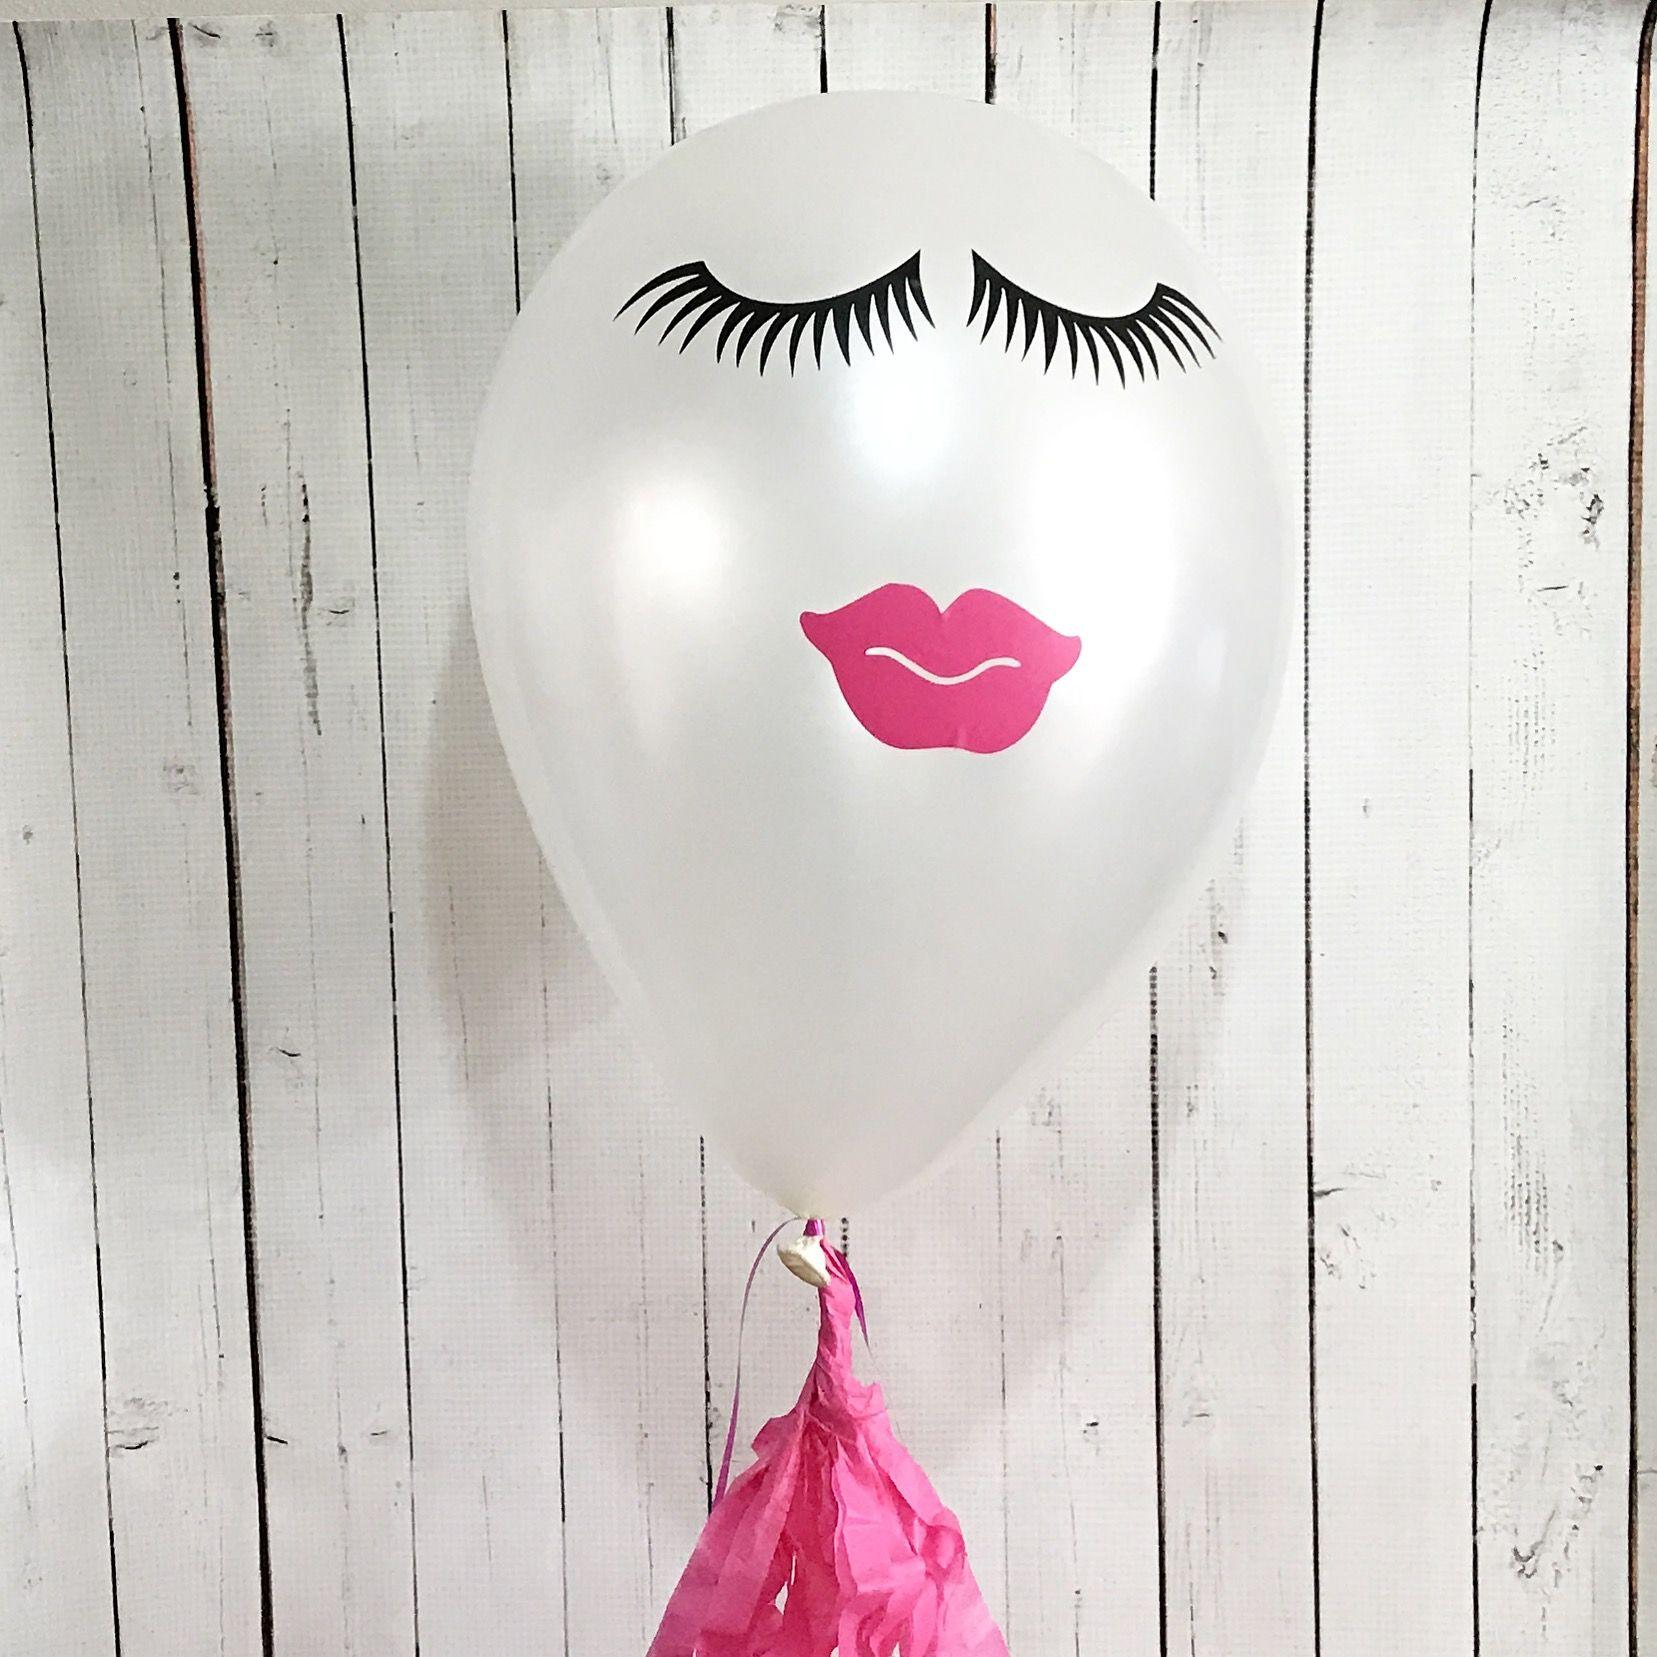 2//5//10x Big Red Lips Foil Balloon Kiss Valentine/'s Anniversary Wedding Decor Pop